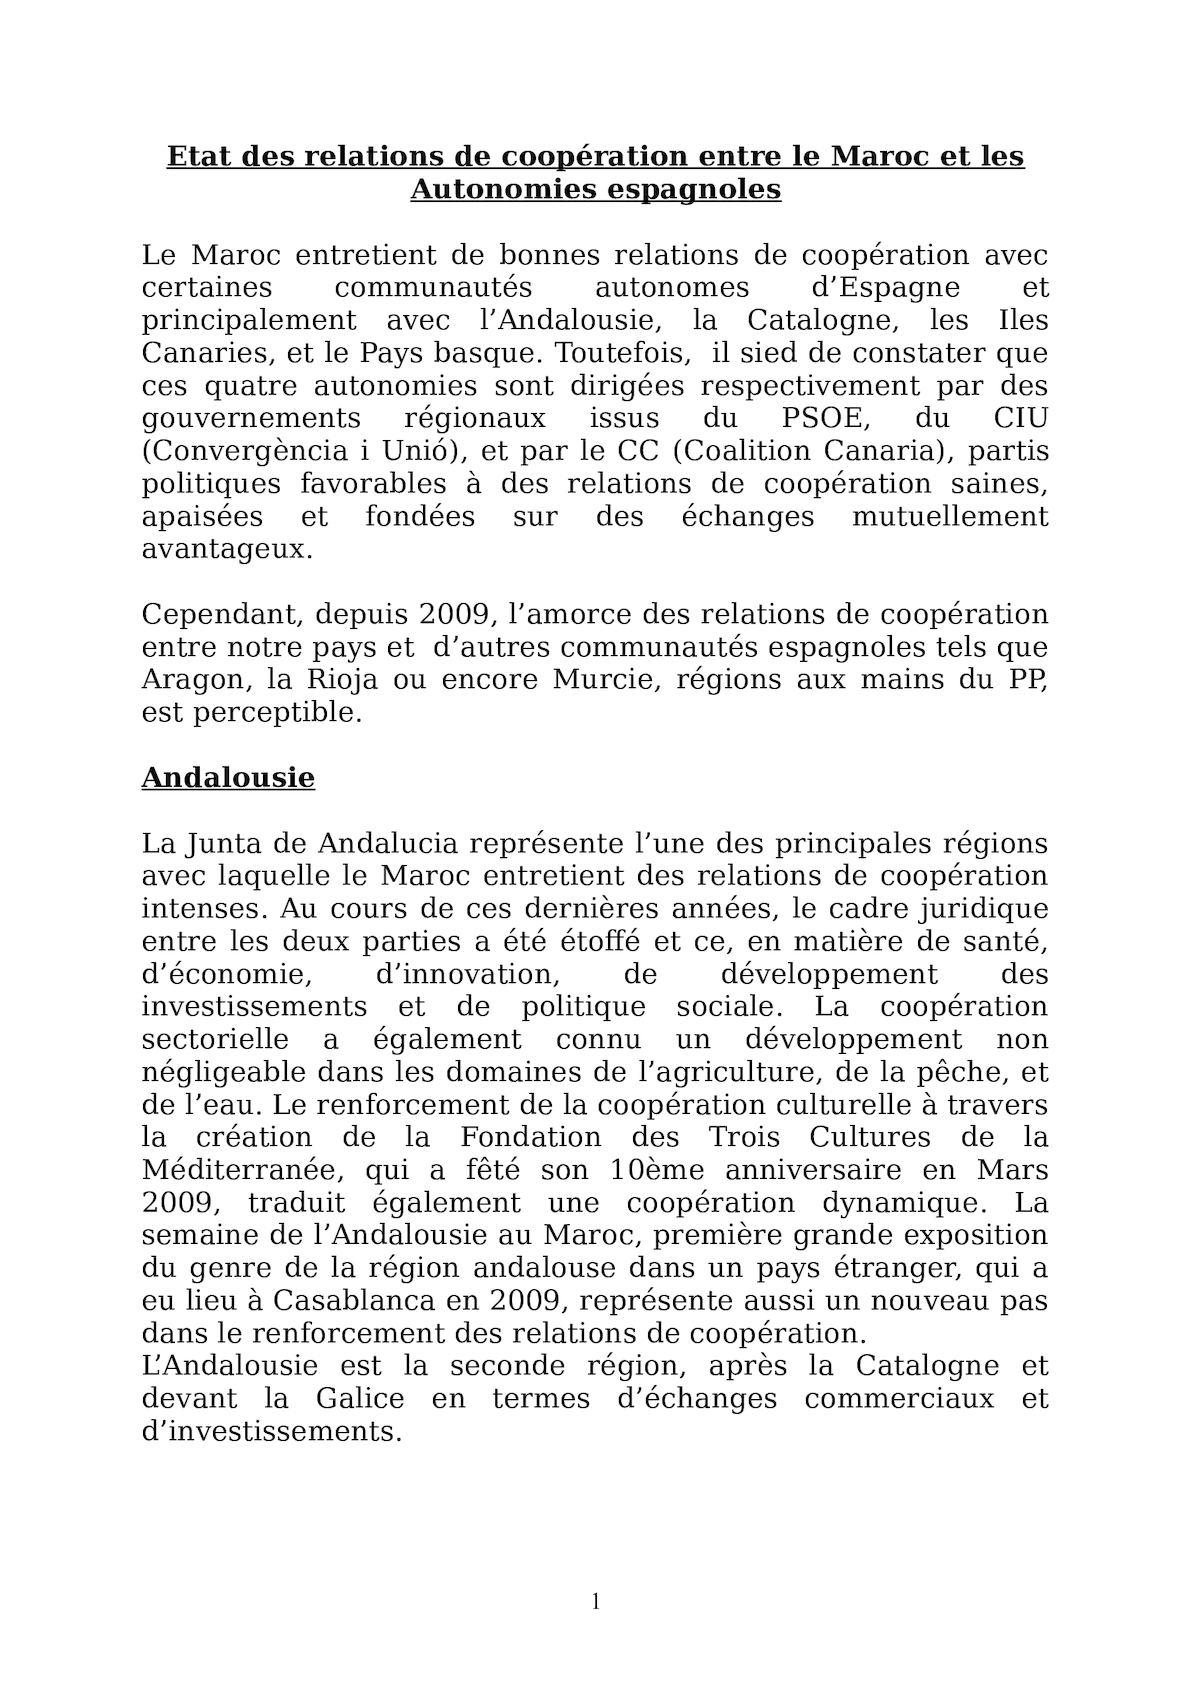 Etat Des Relations De Cooperation Maroc Autonomies Oct 11